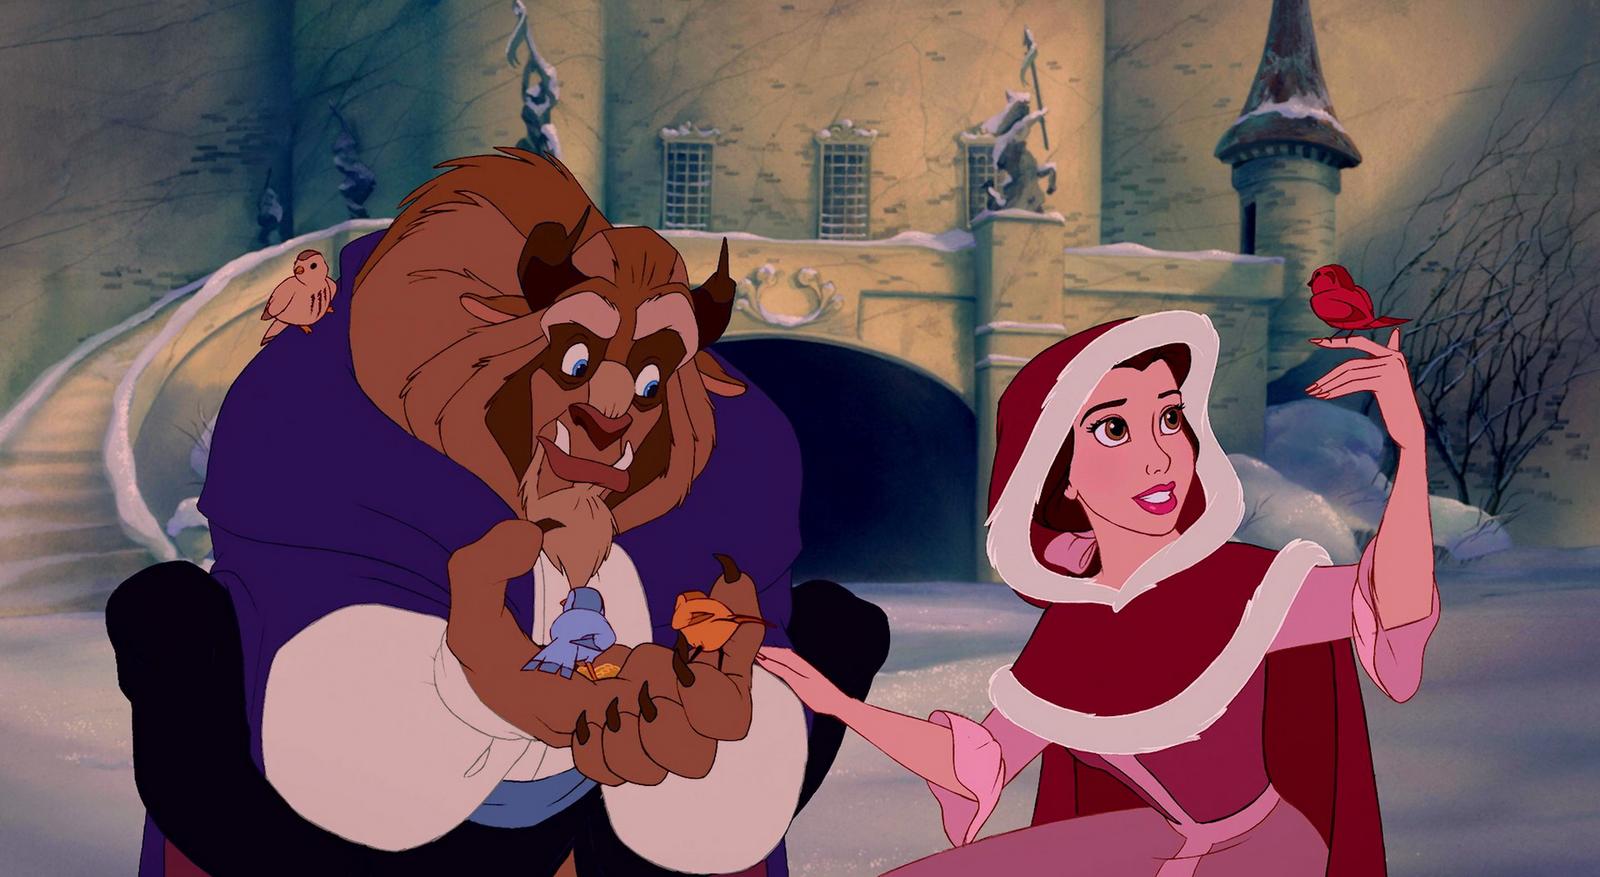 La Verdadera Historia De Walt Disney Sus Dibujos Y: La Verdadera Historia De 'La Bella Y La Bestia'